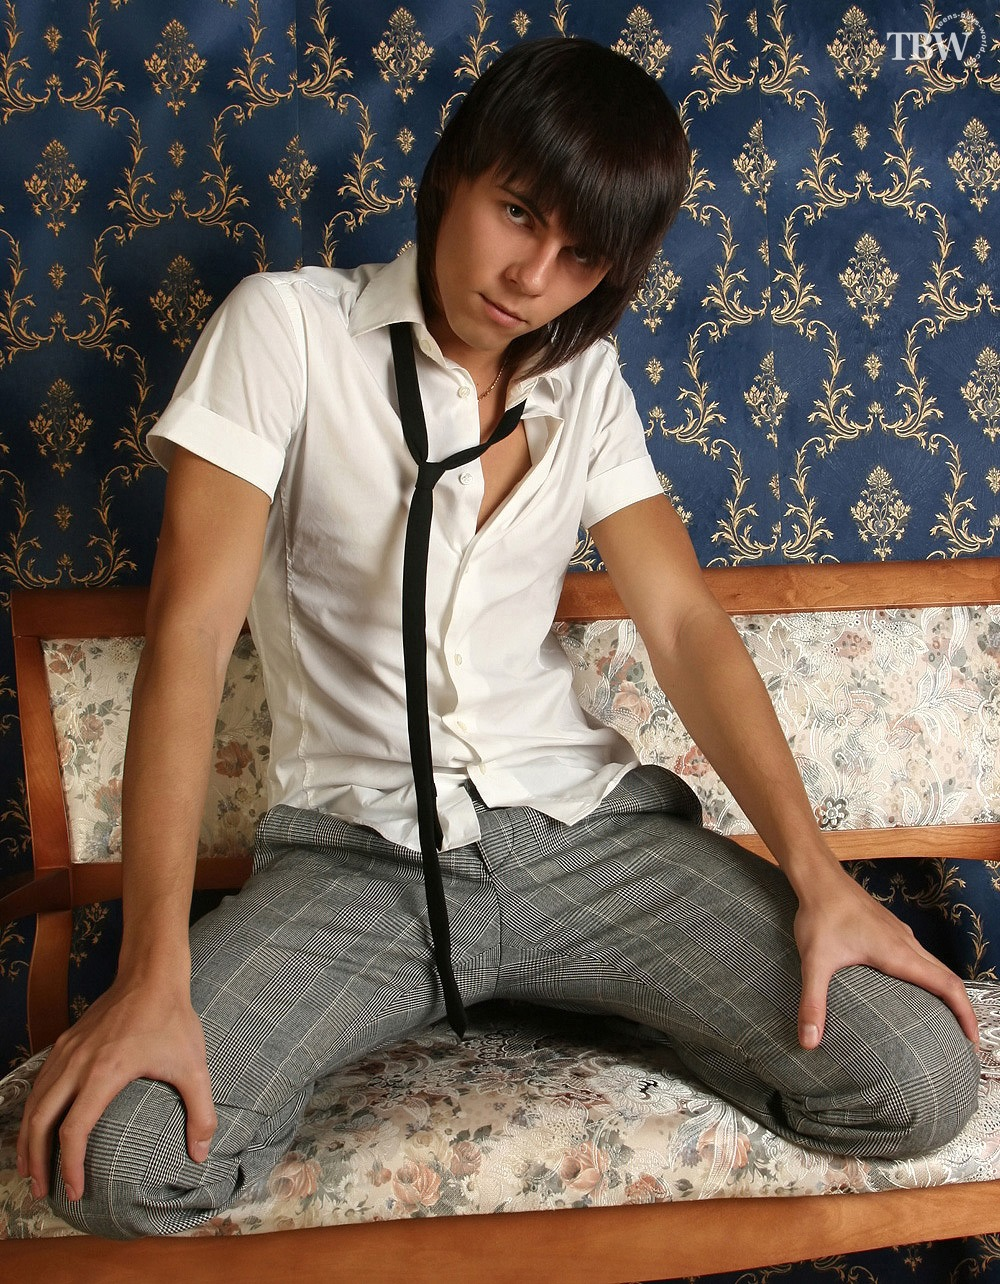 Teen boy stripping nude galleries gay adam 3